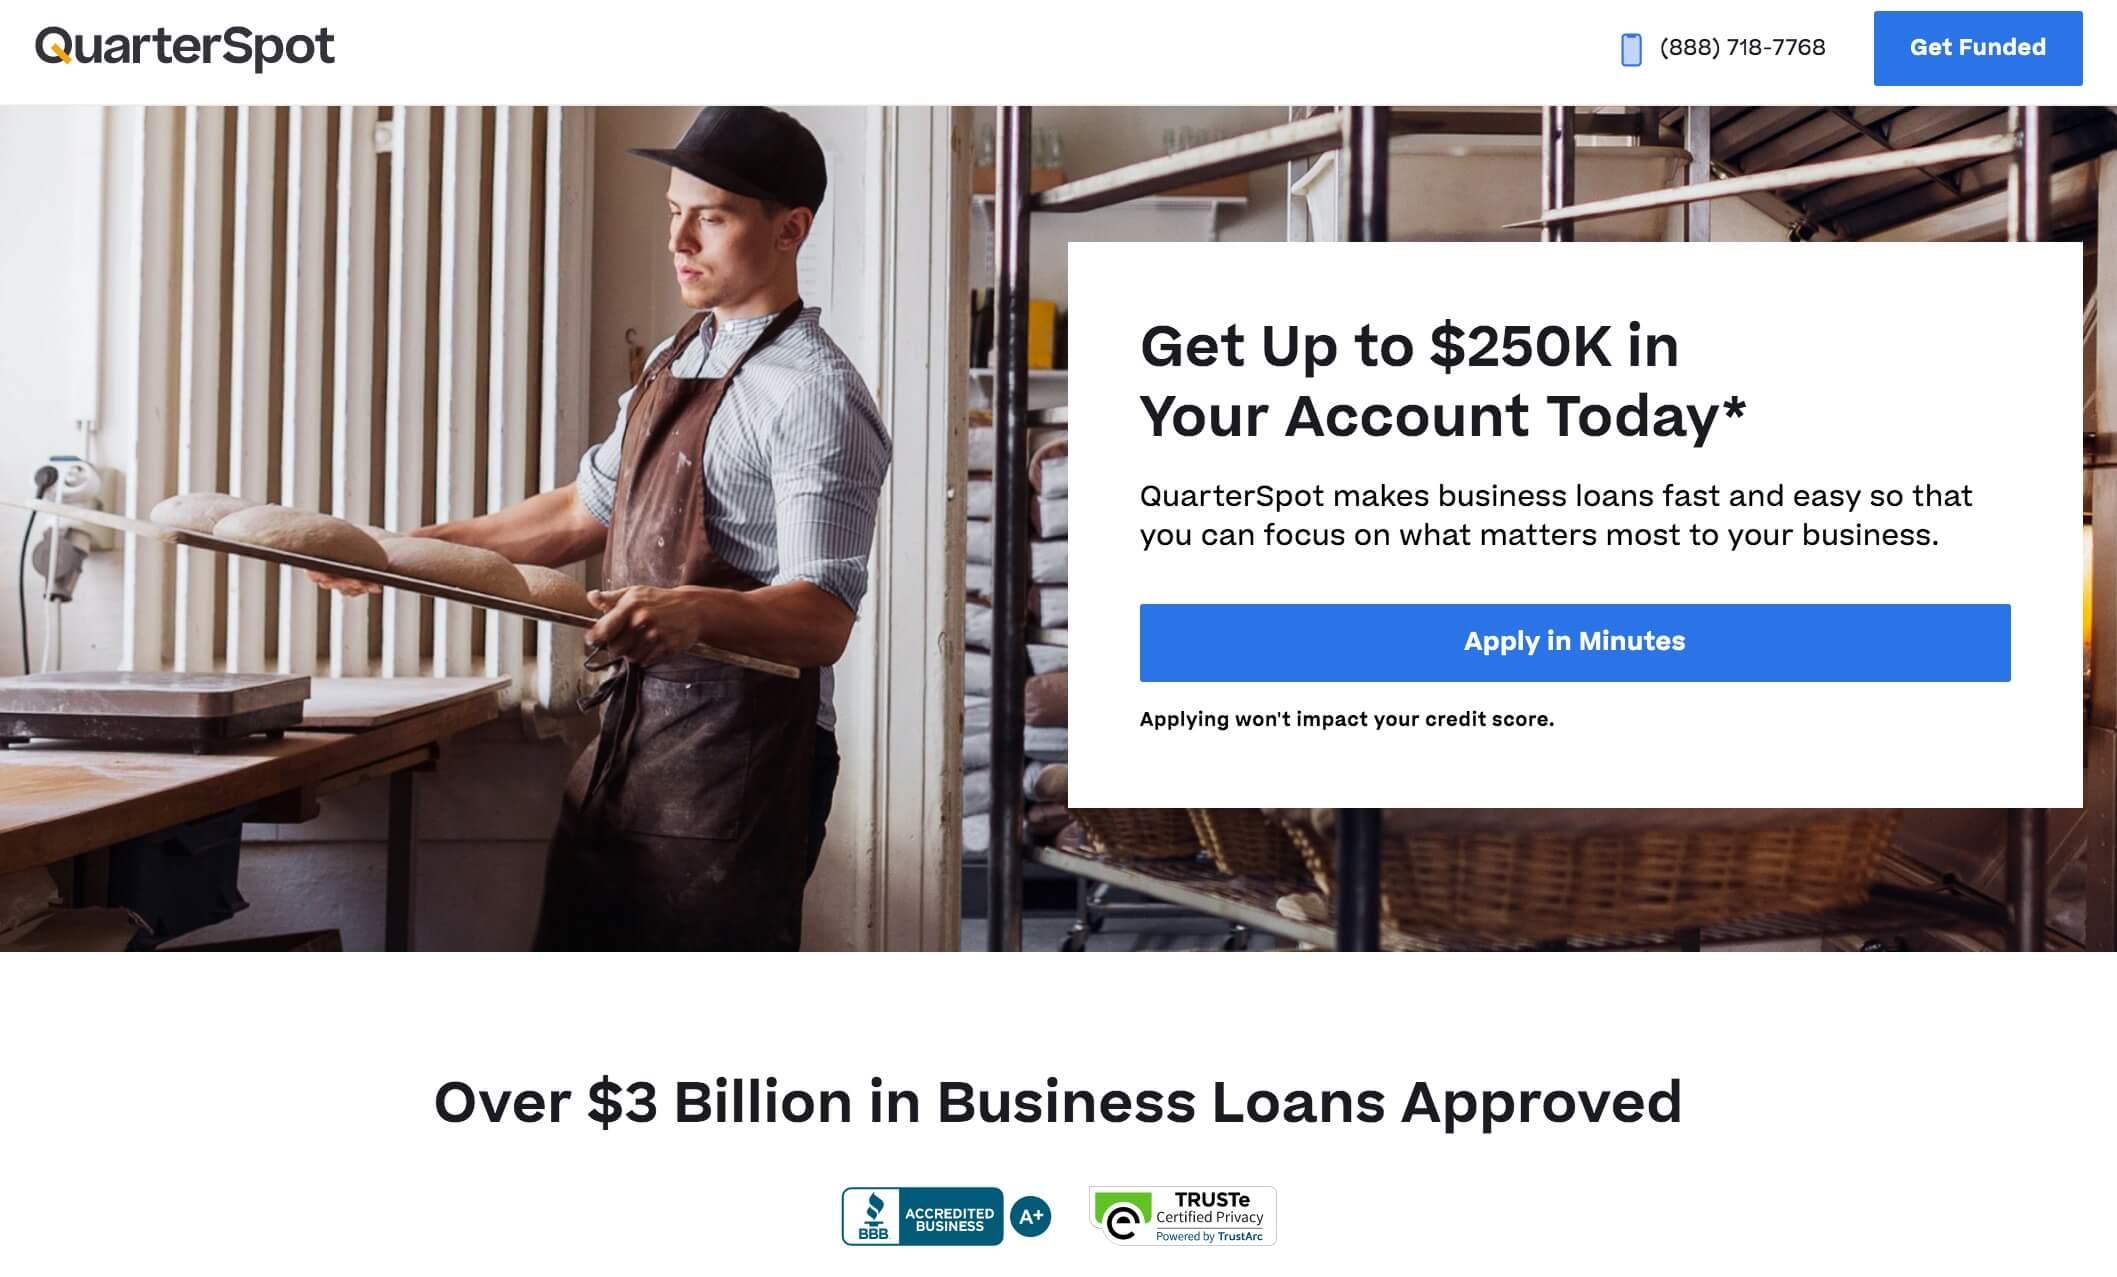 quarterspot loans